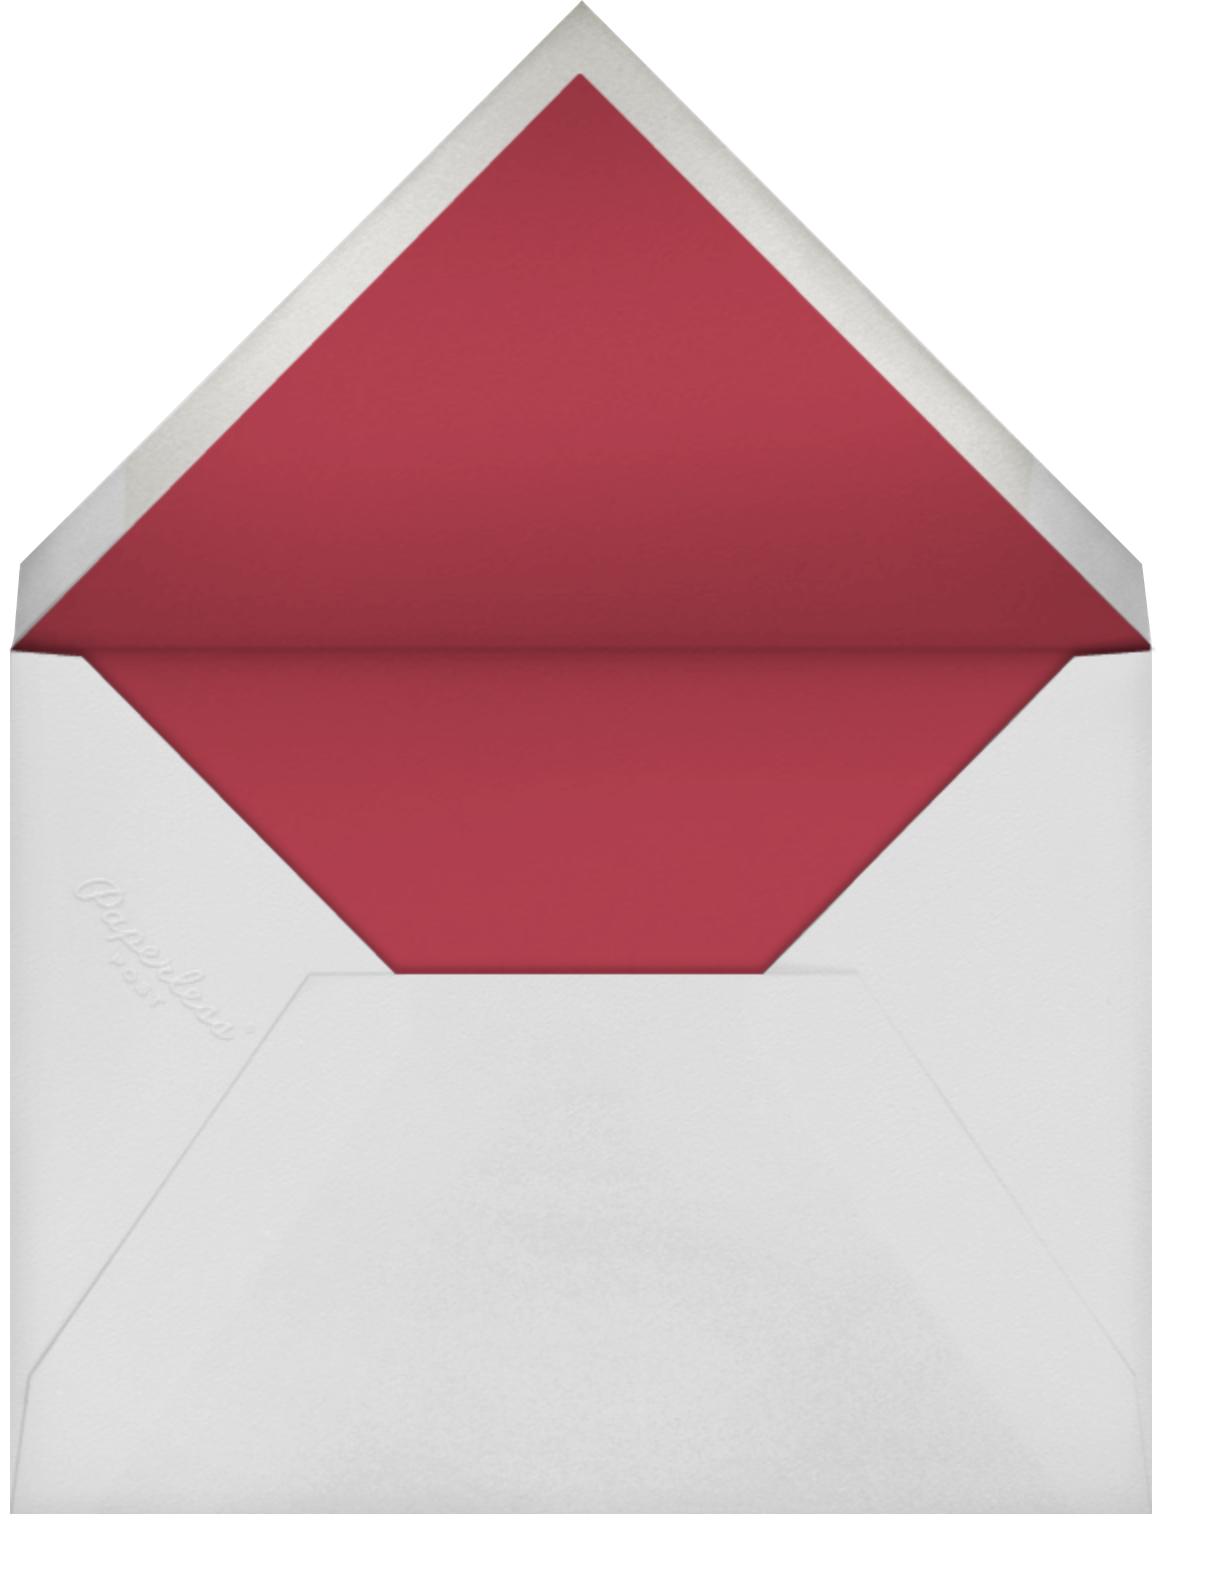 Falling Hearts Photo - Merlot - kate spade new york - Valentine's Day - envelope back